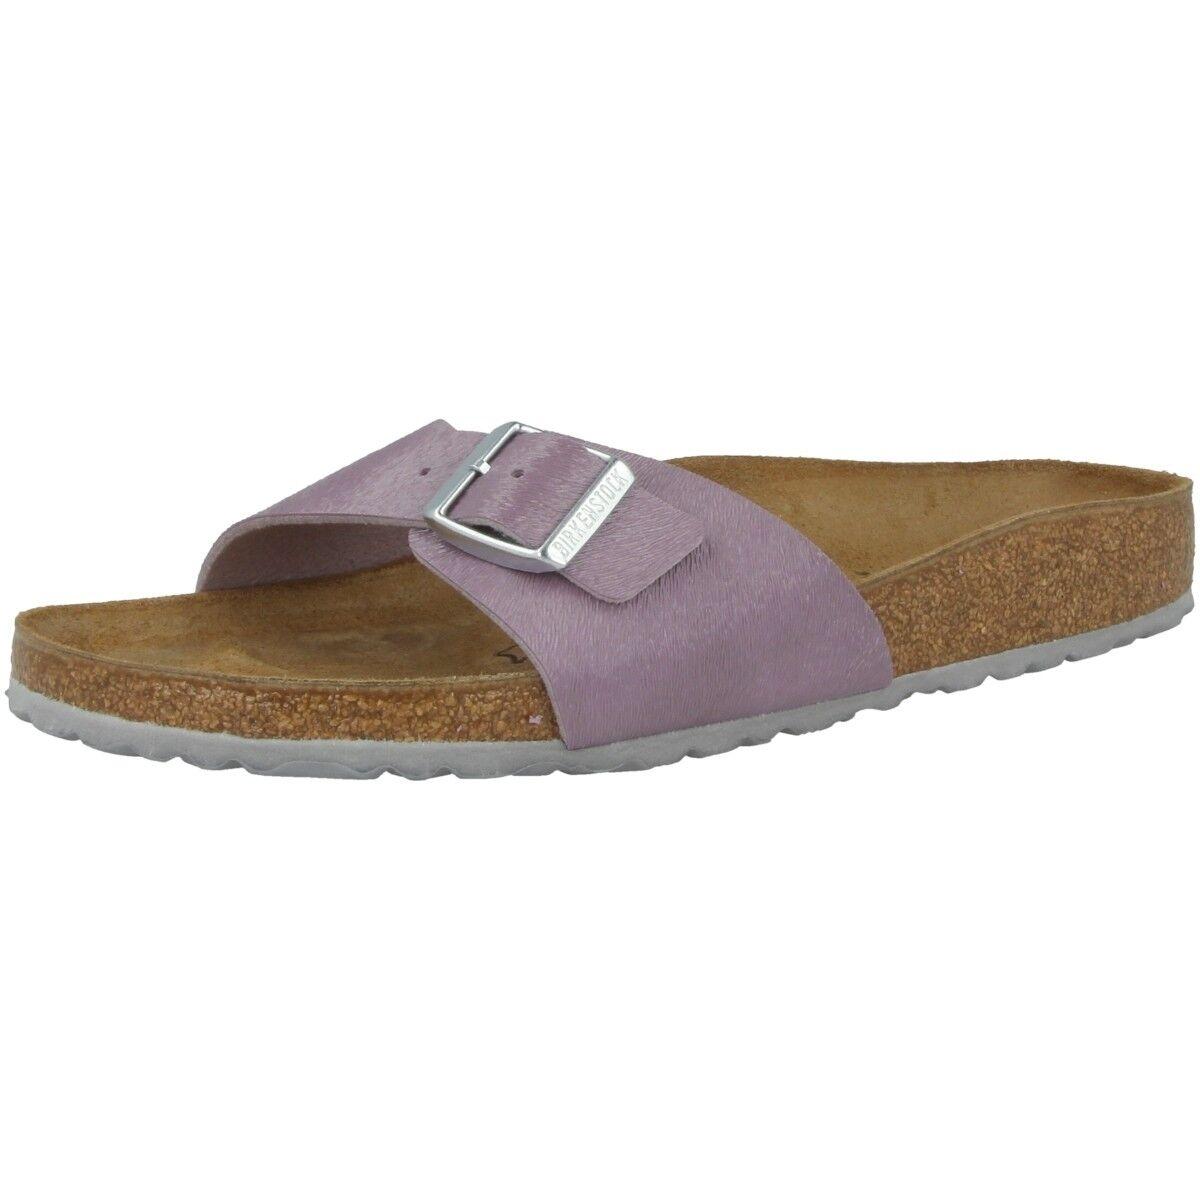 Birkenstock Madrid Birko-Flor Schuhe Pantoletten purple Weite schmal 1008660